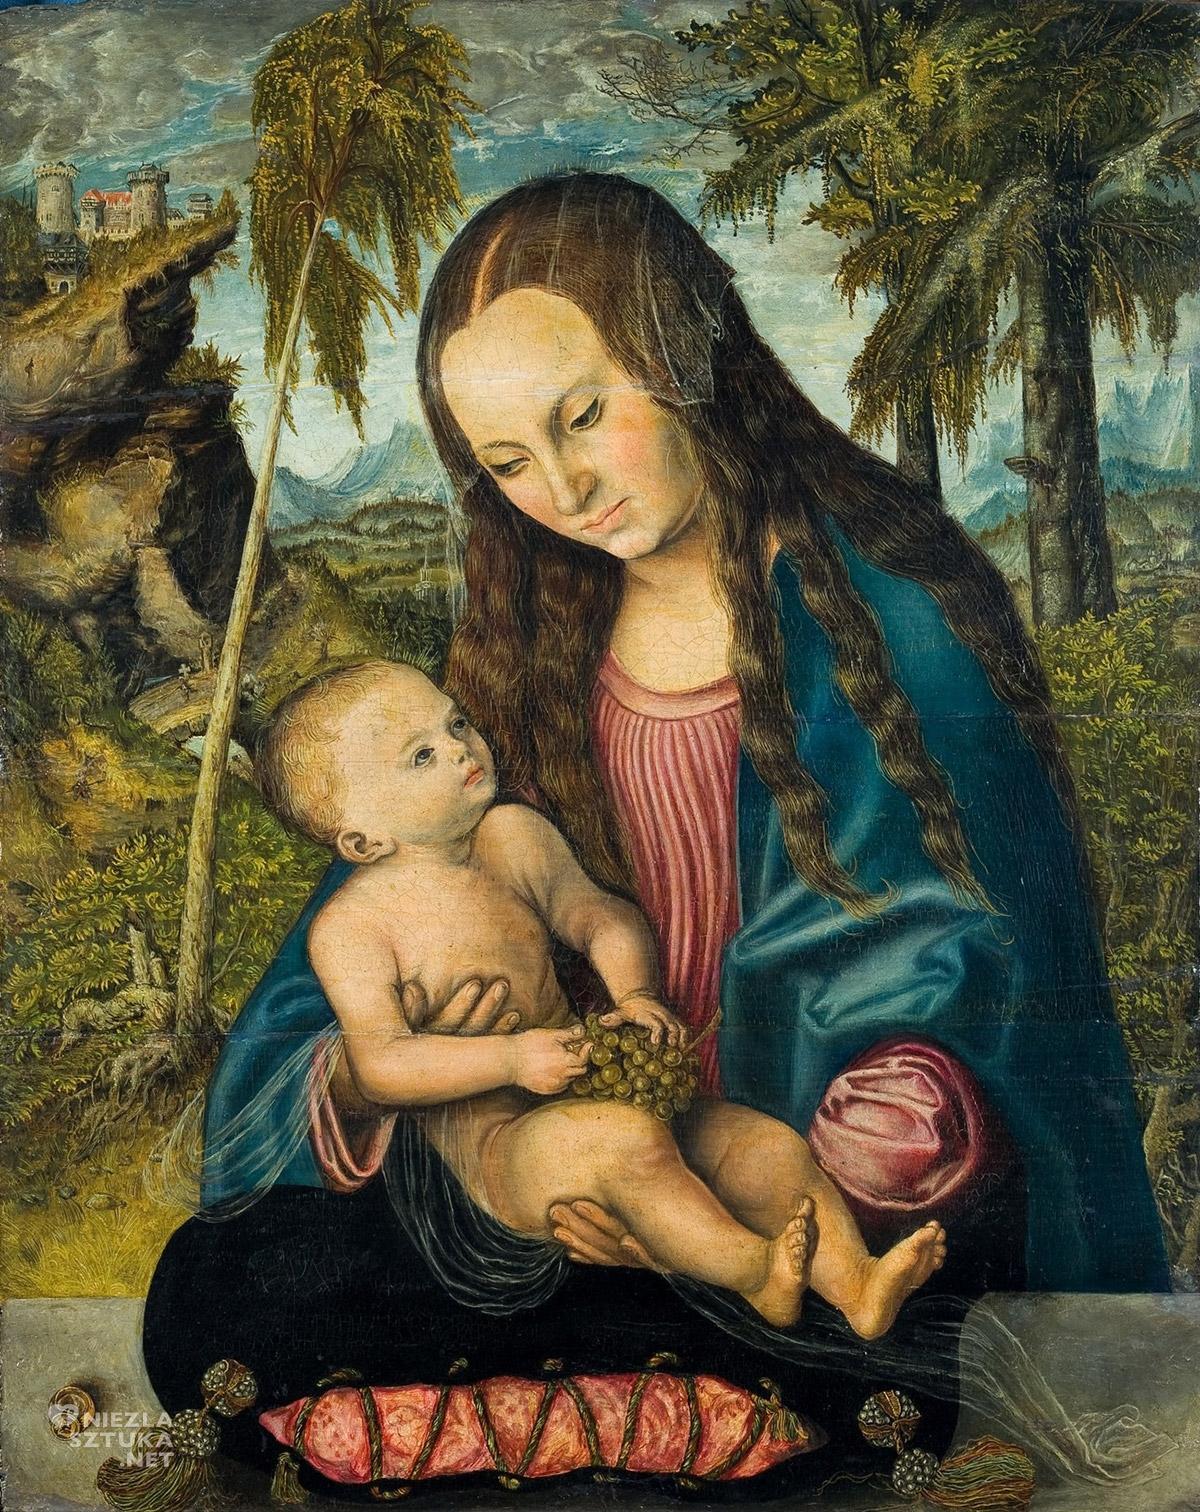 Madonna pod jodłami, Georg Kupke, kopia obrazu Madonna pod jodłami, Lucas Cranach, Wrocław, Niezła sztuka